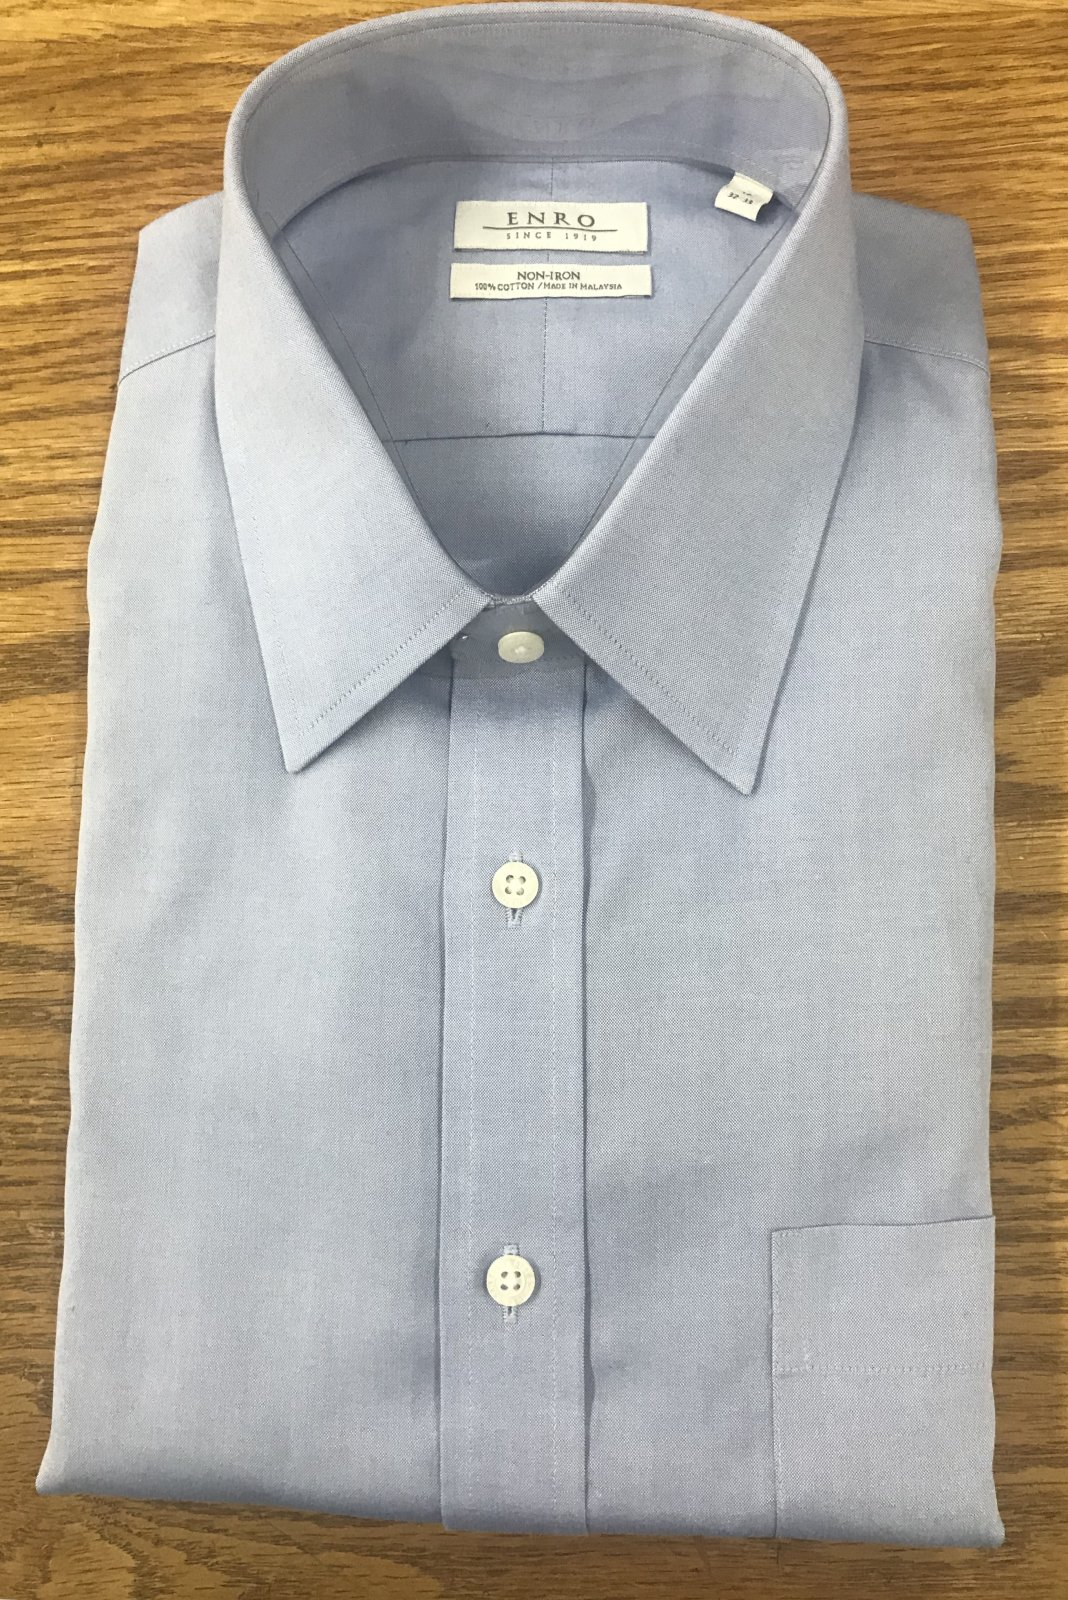 Enro LS Dress Shirt Tall 111010